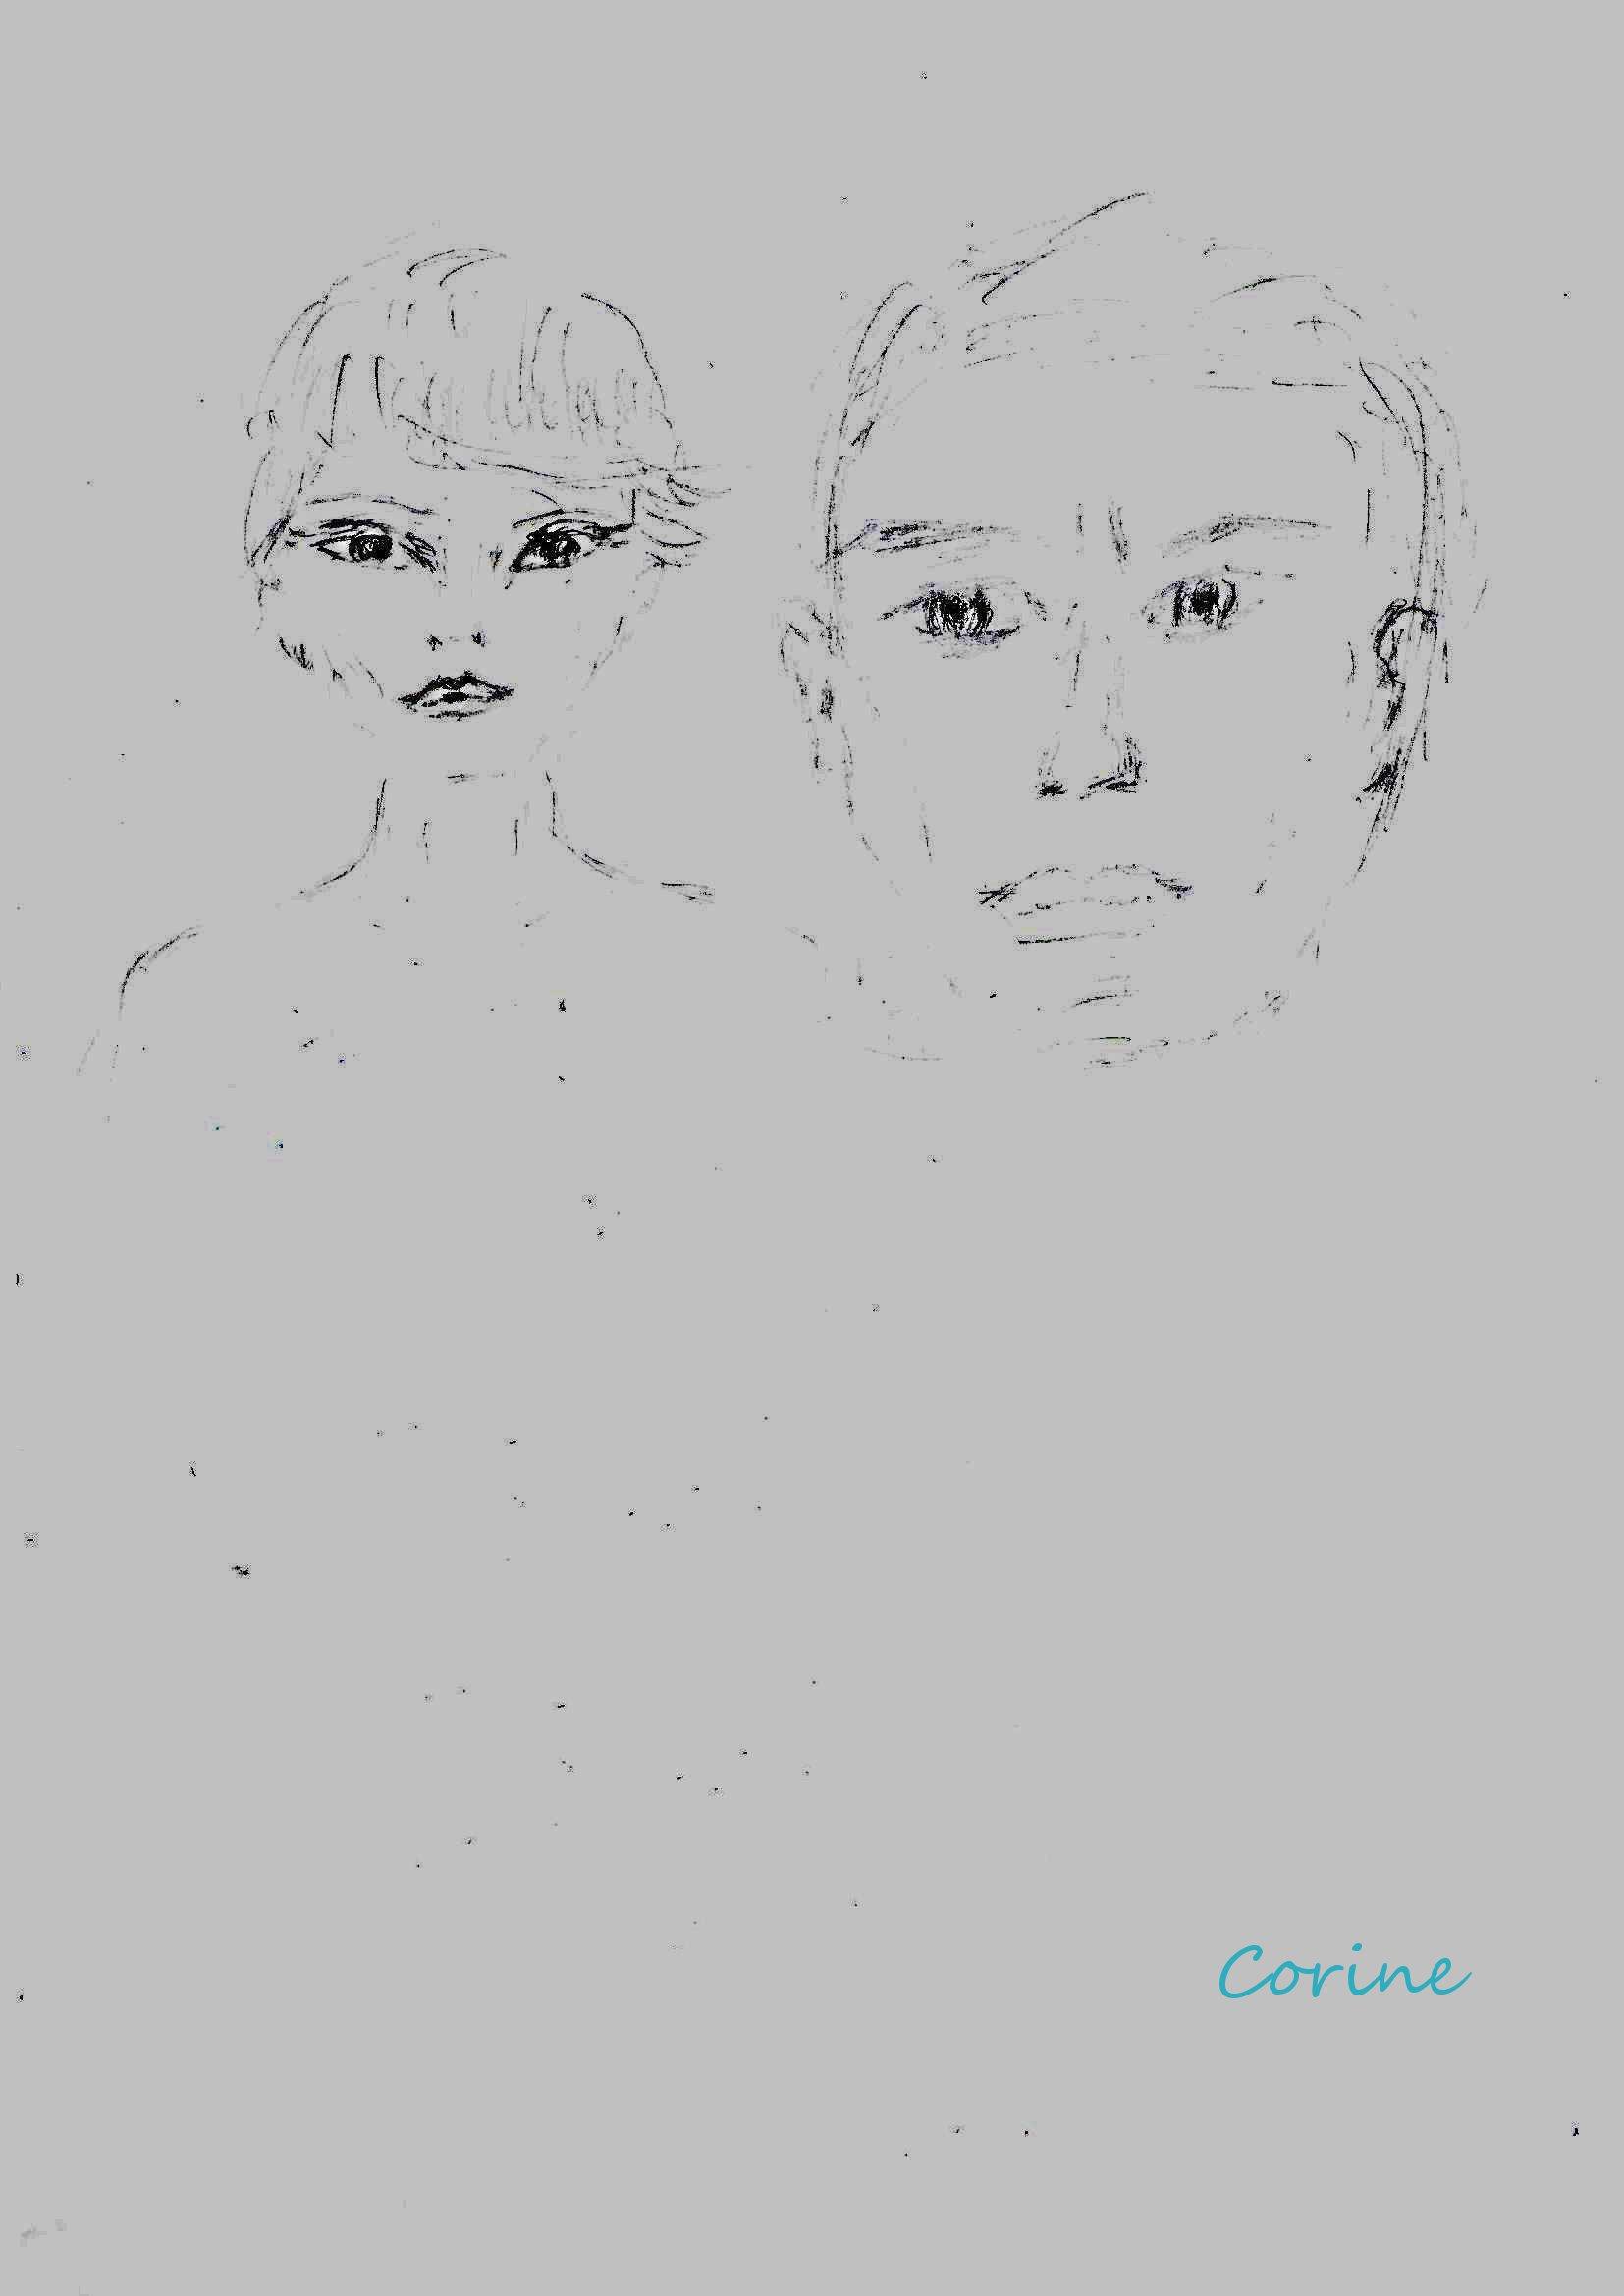 mes dessins 16.06.19.jpg